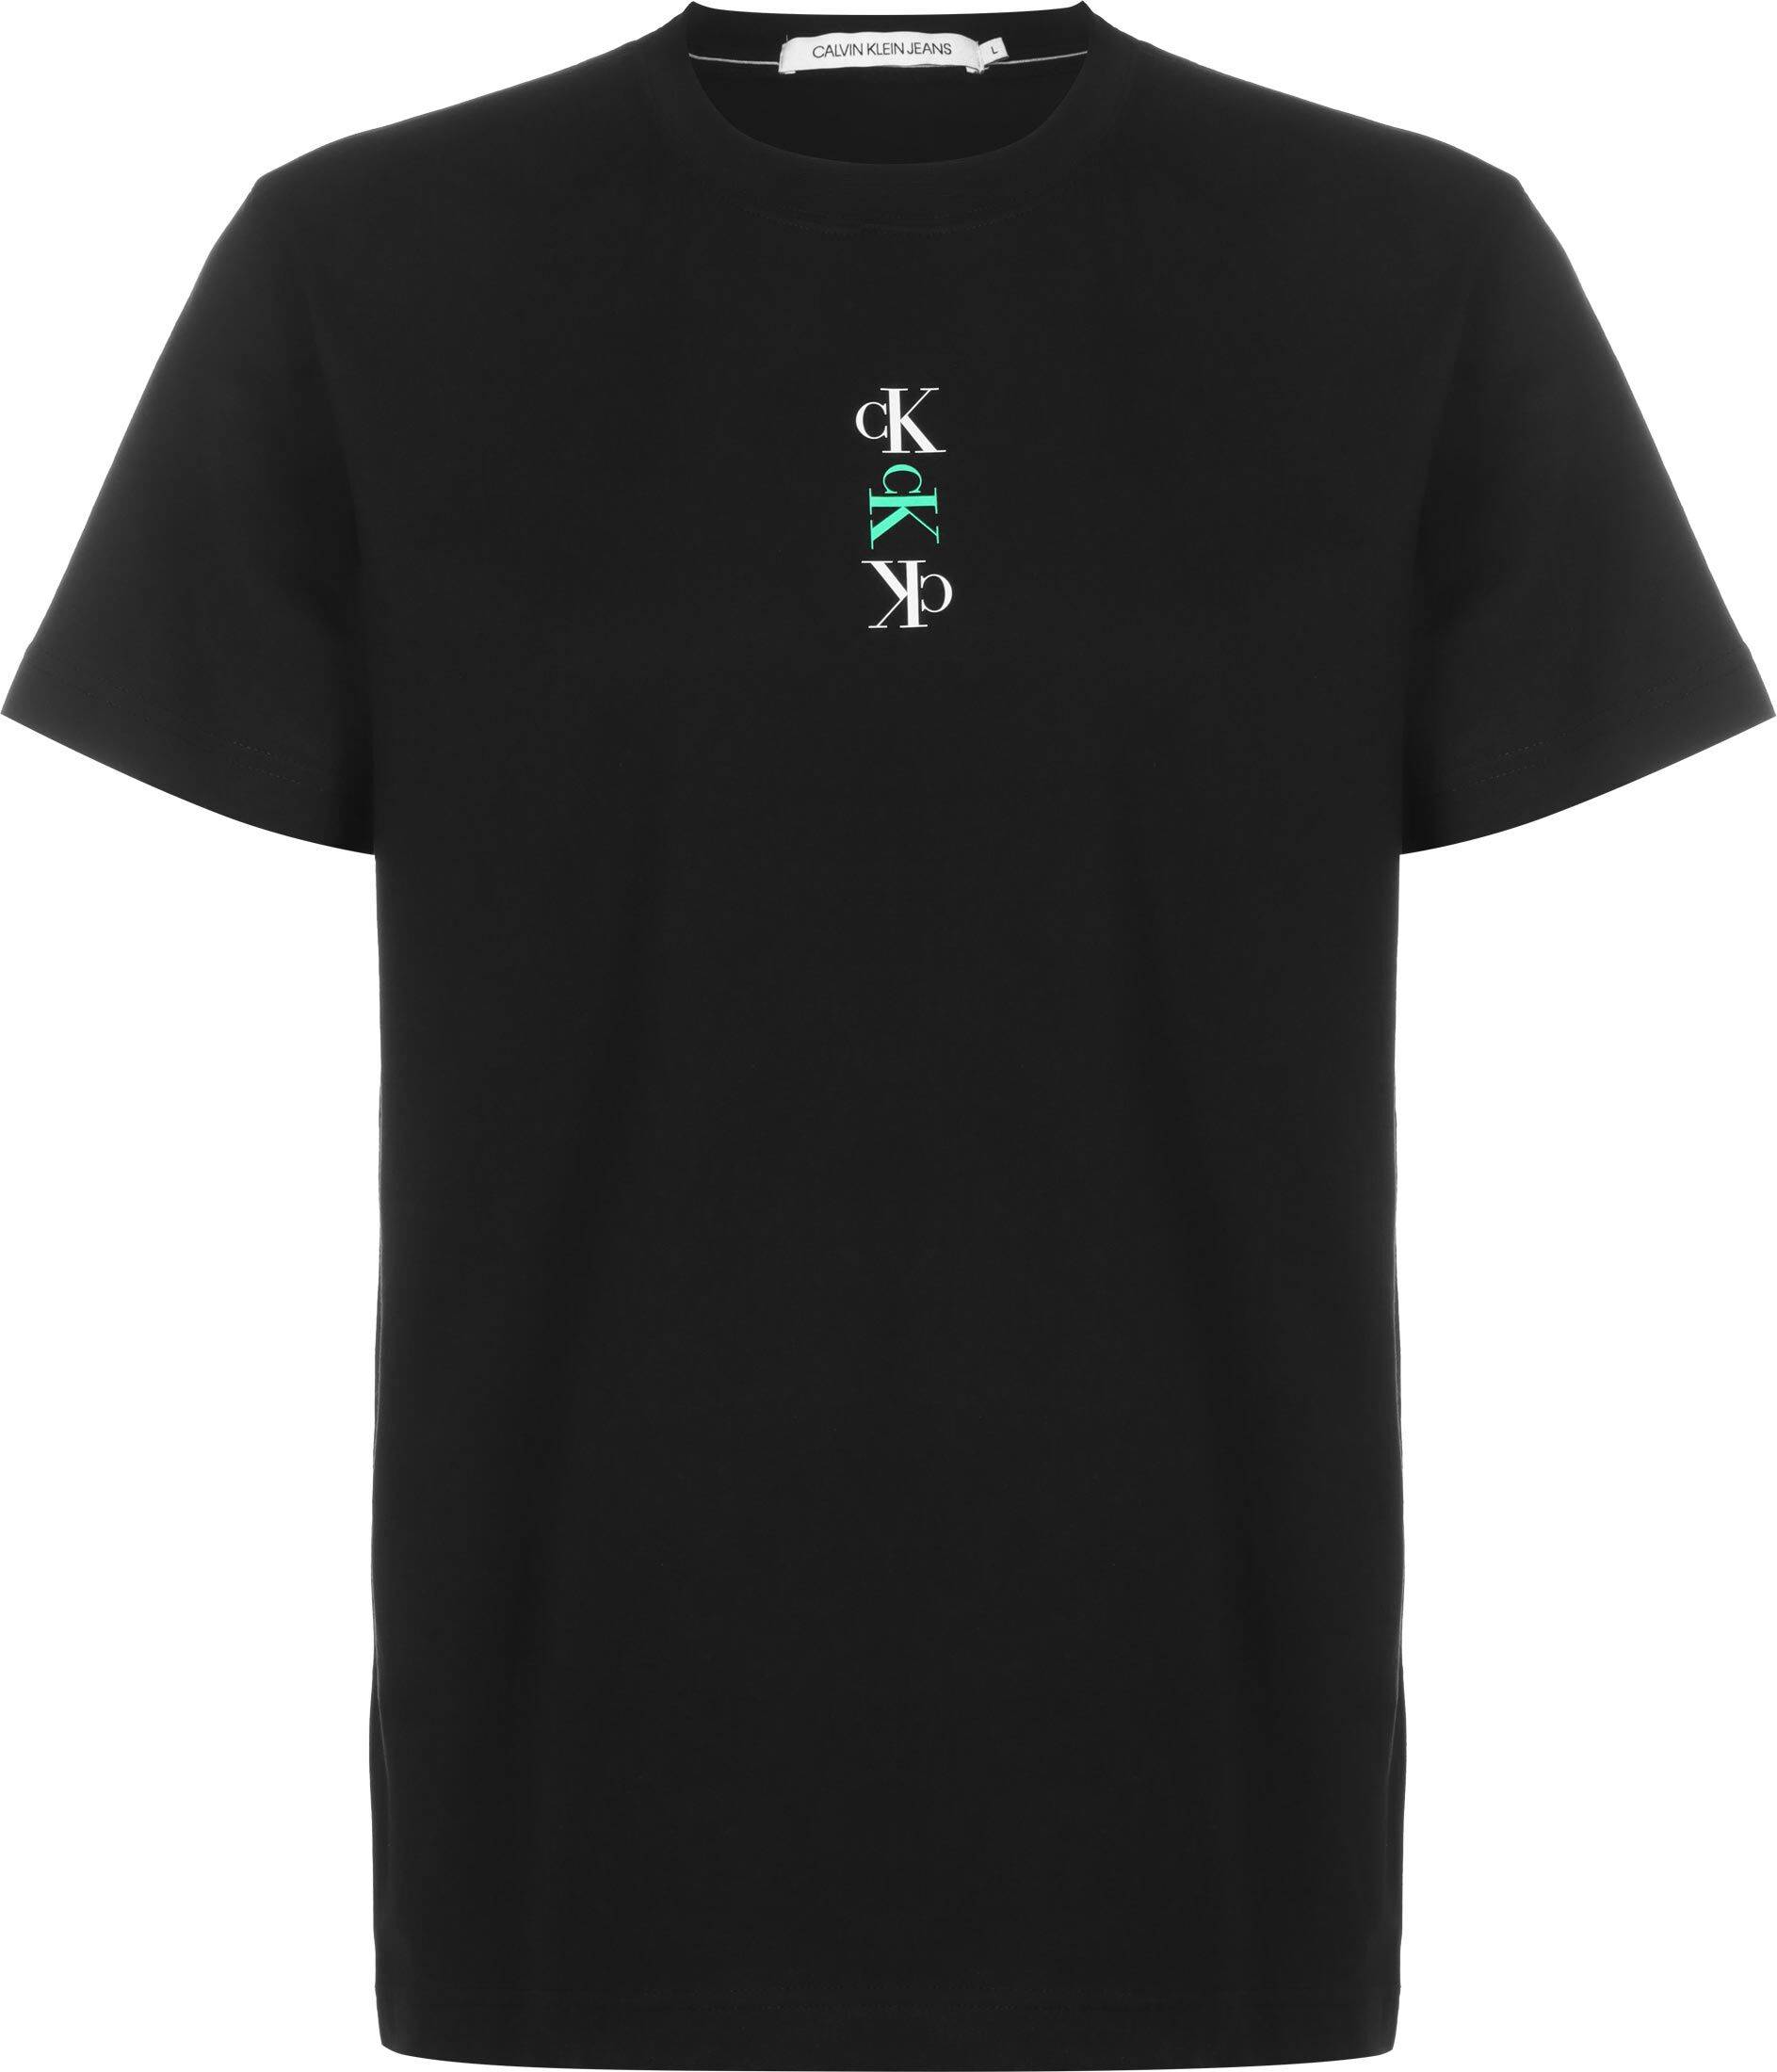 Calvin Klein Jeans Calvin Klein Repeat Graphic Text, taille L, homme, noir